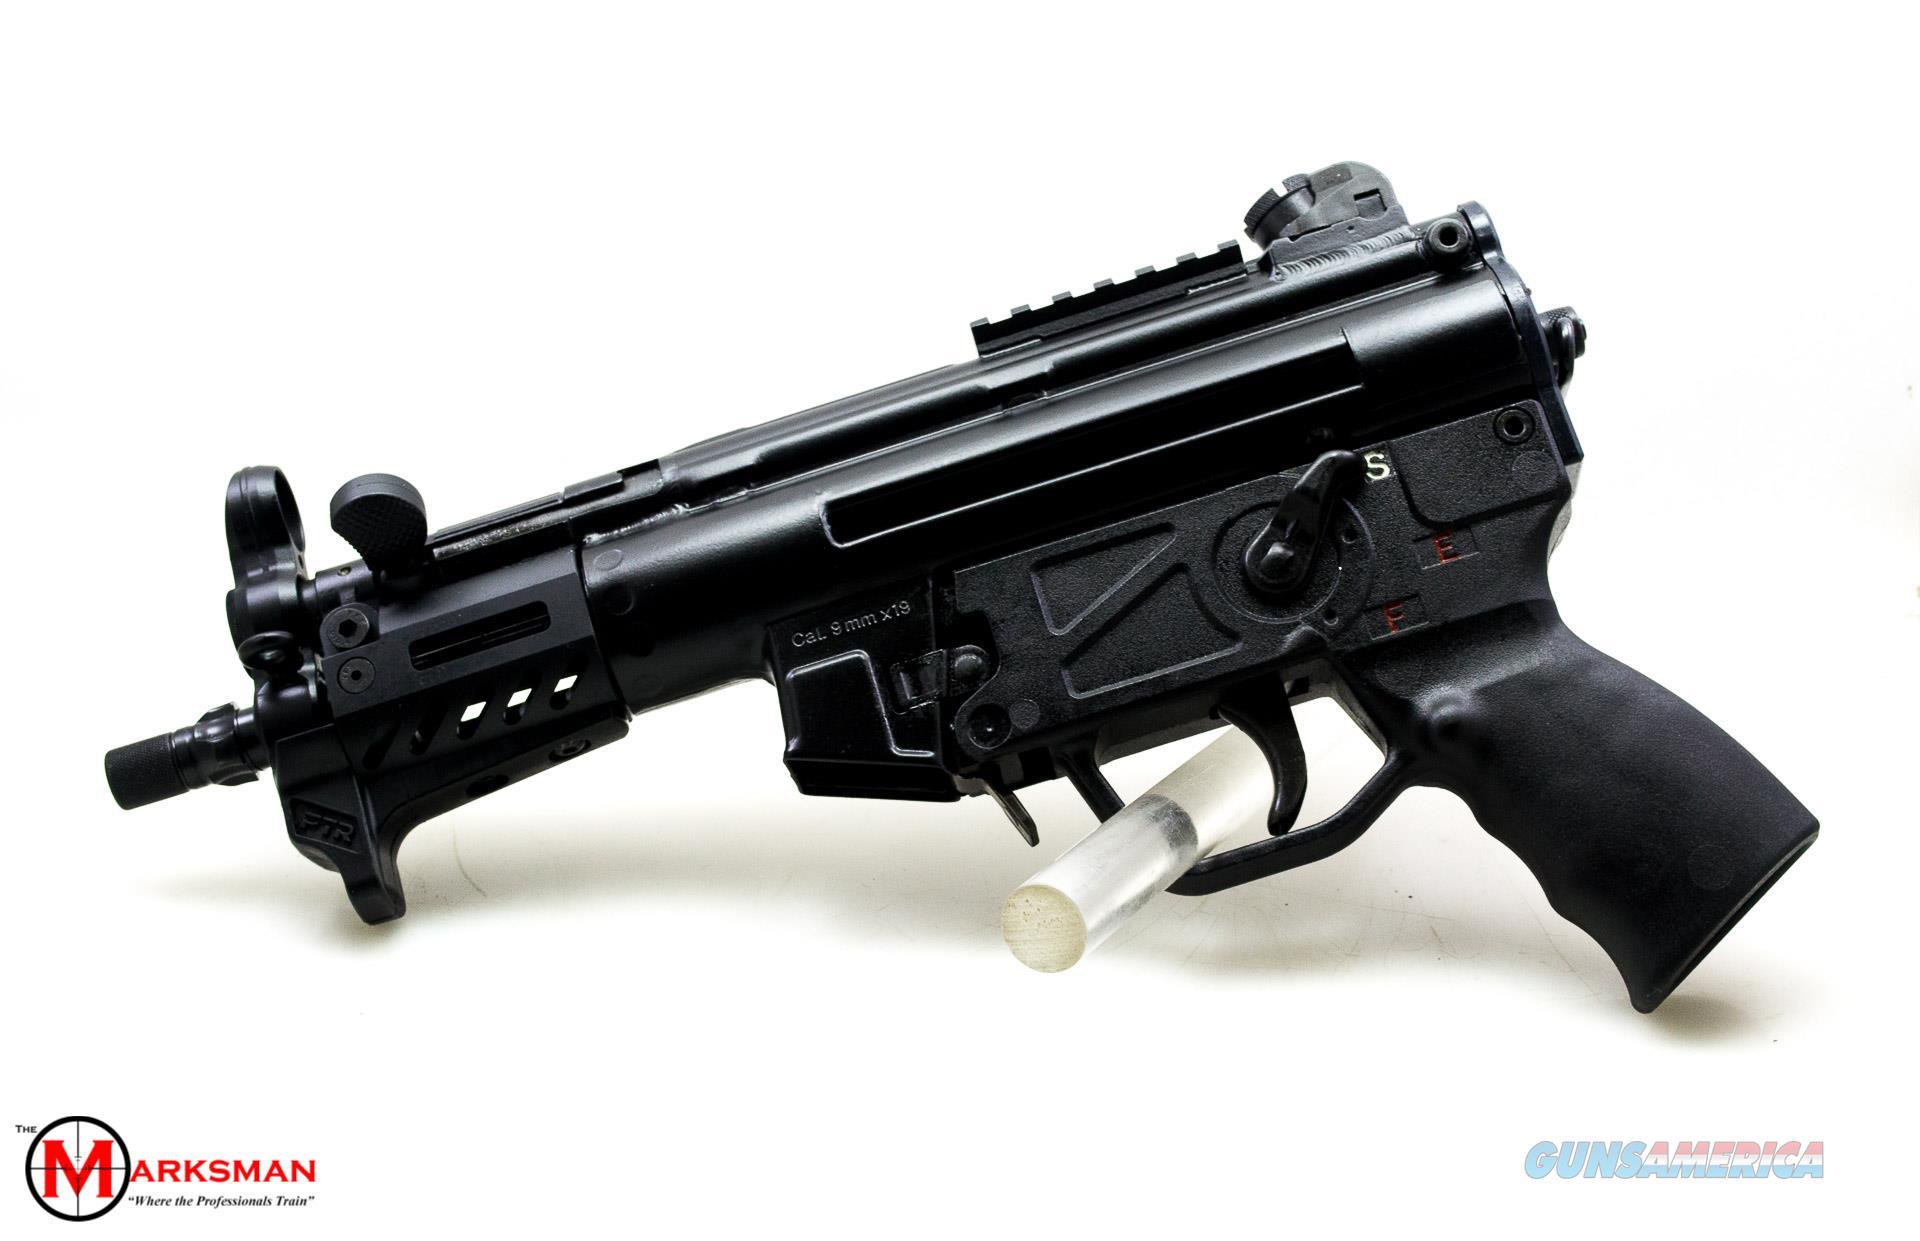 "PTR 9 KT Pistol, 9mm, 5.83"" Barrel NEW PTR 603  Guns > Pistols > PTR Pistols"